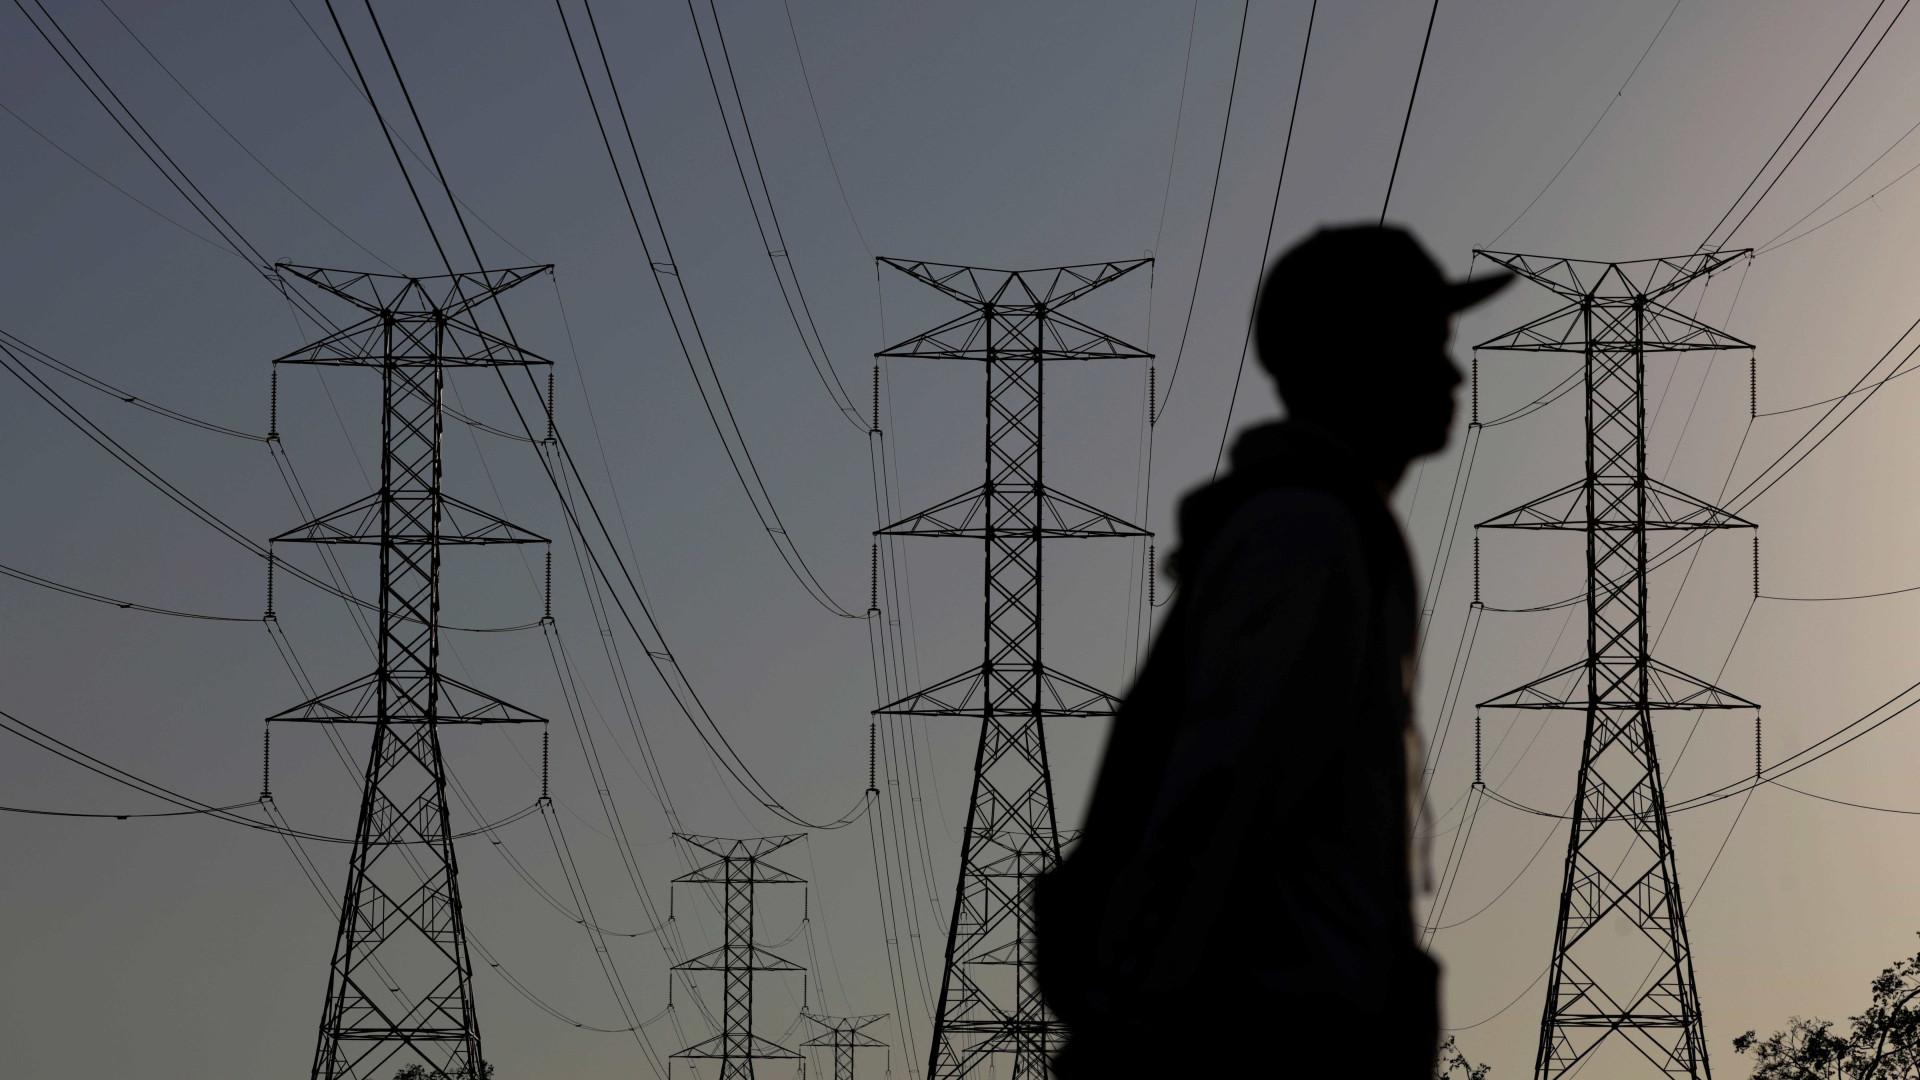 Carga de energia elétrica sobe 2% em março, diz ONS